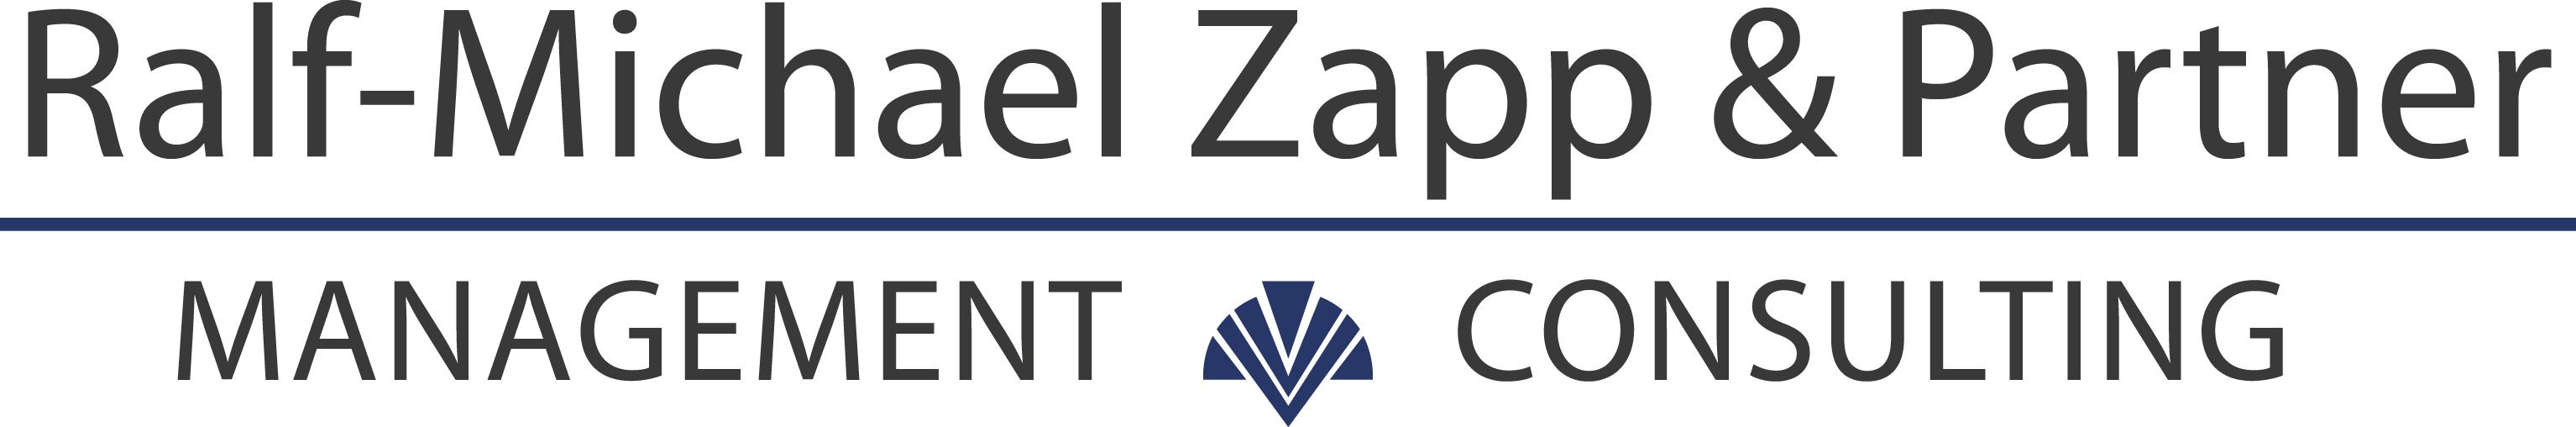 ZAPP-Consulting Logo 4c.indd